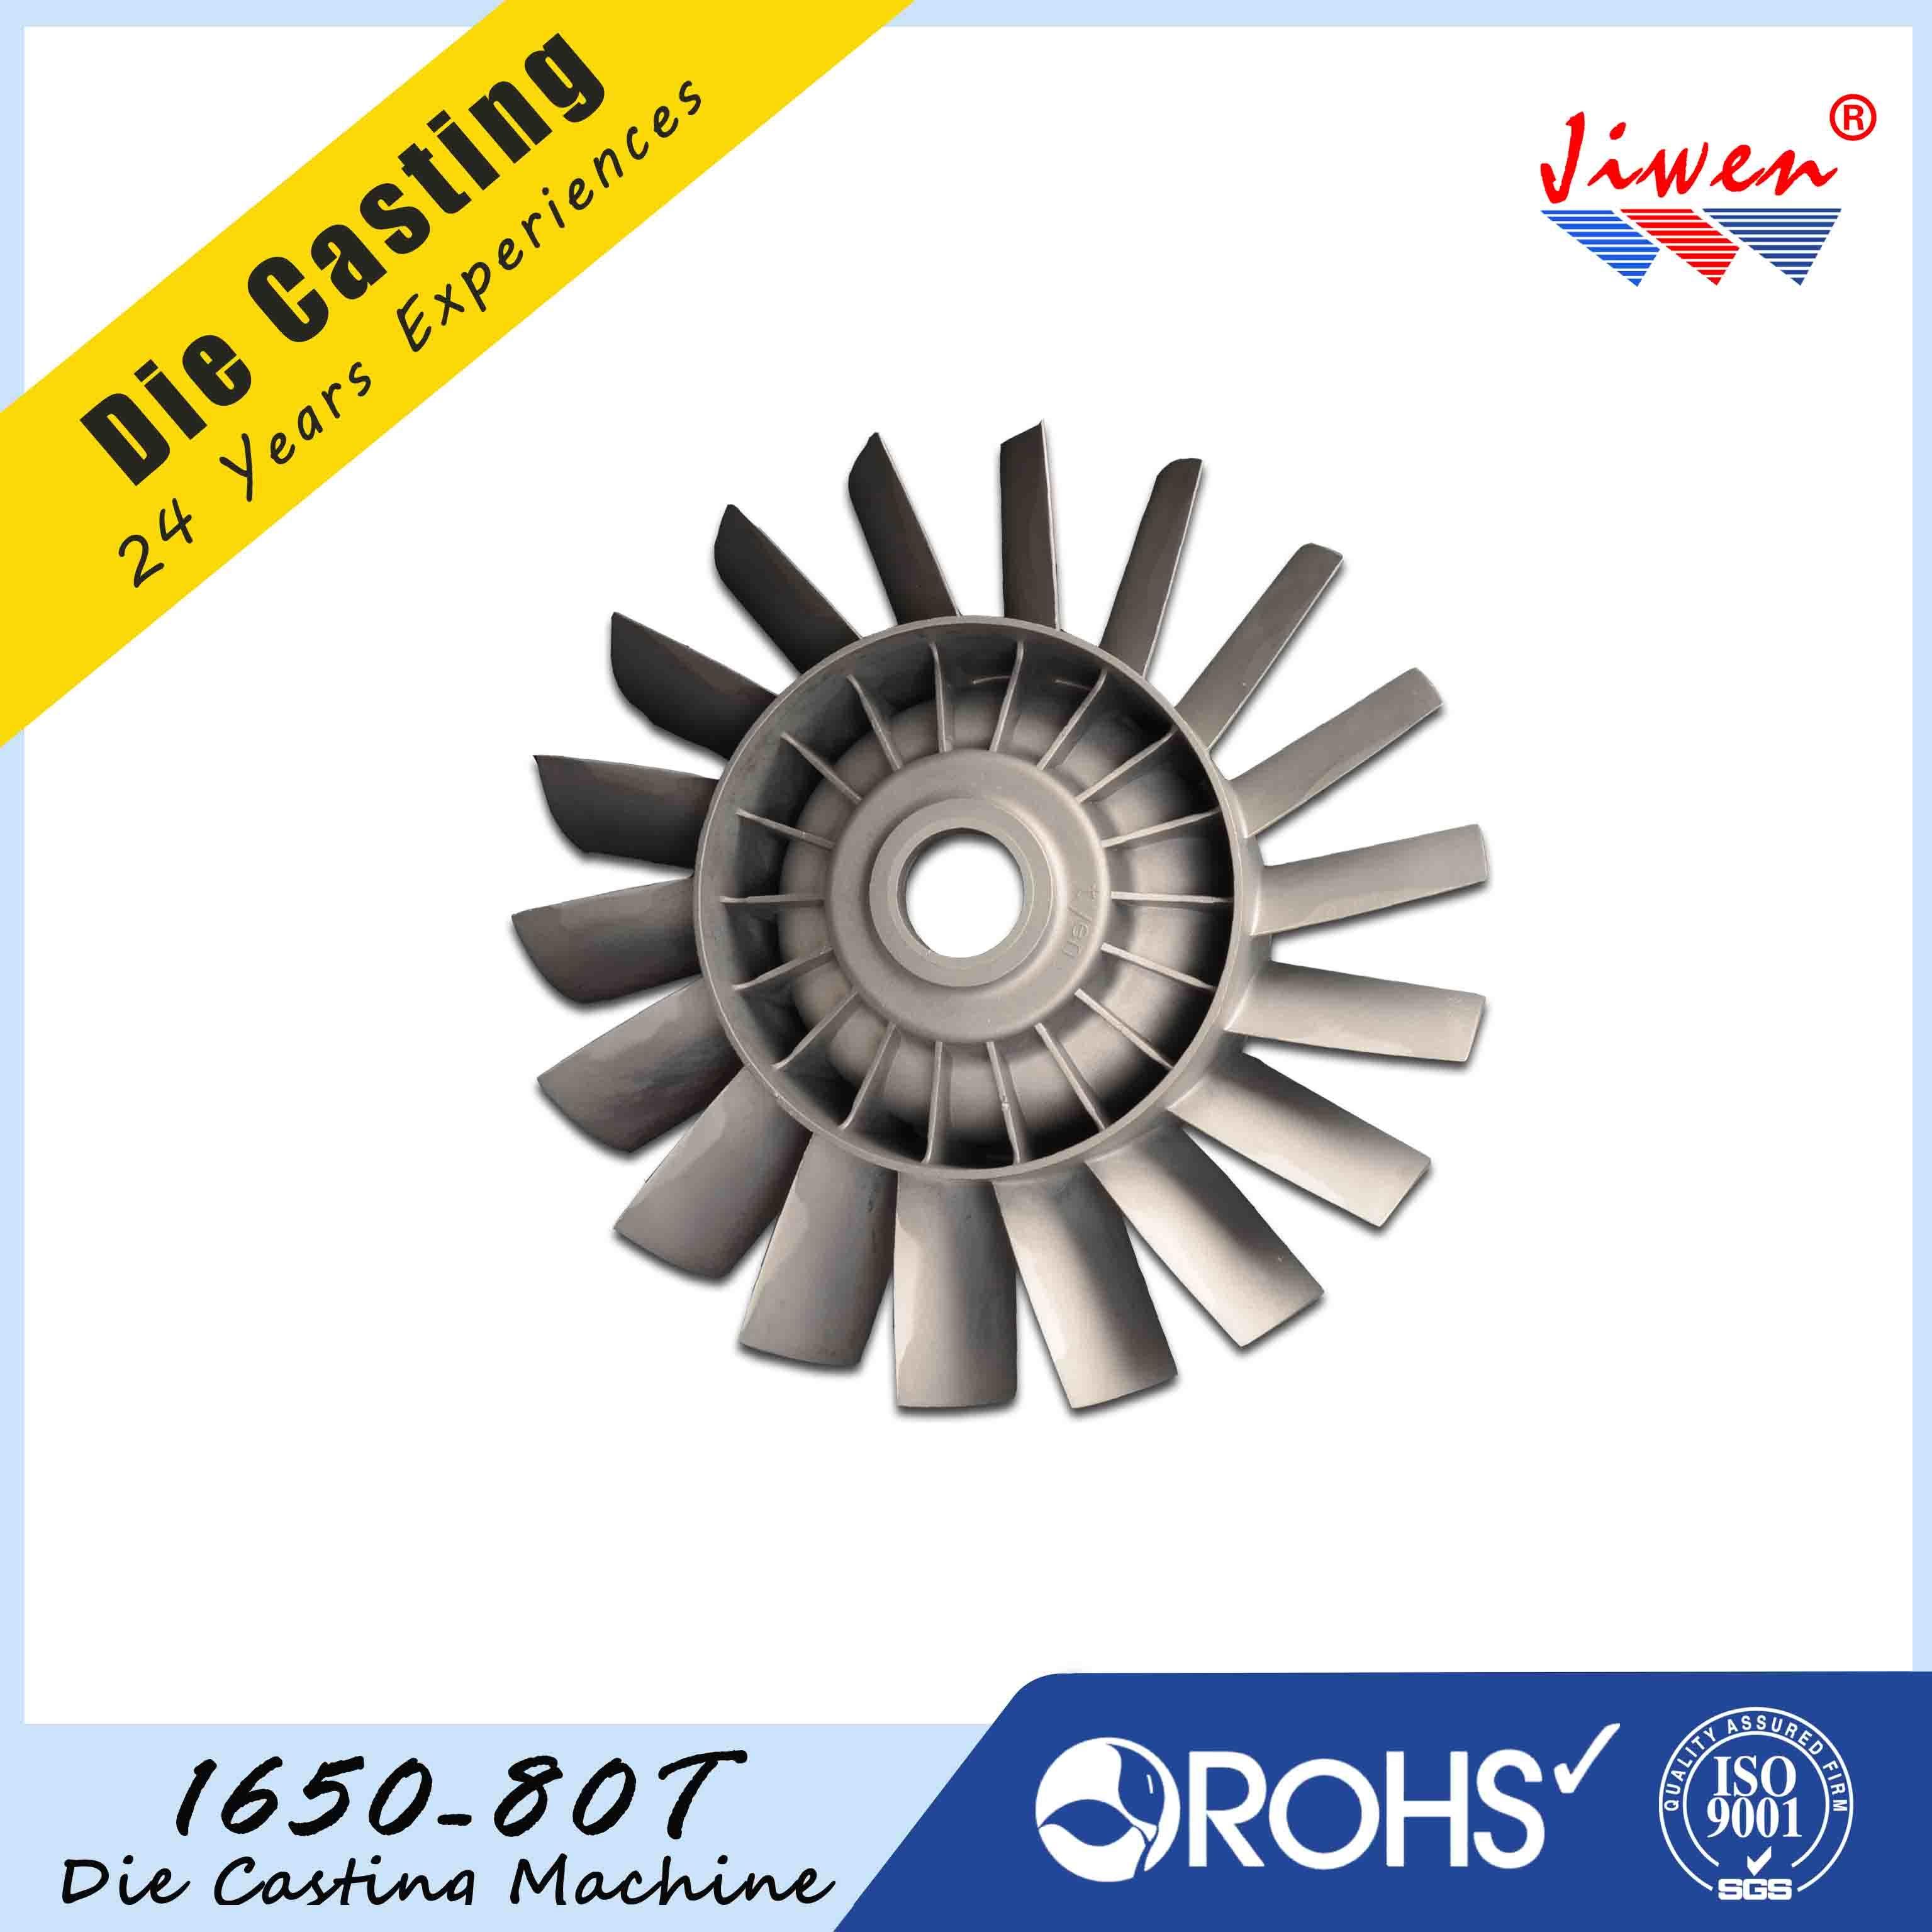 Compressor Wheel Used for Turbocharger Engine